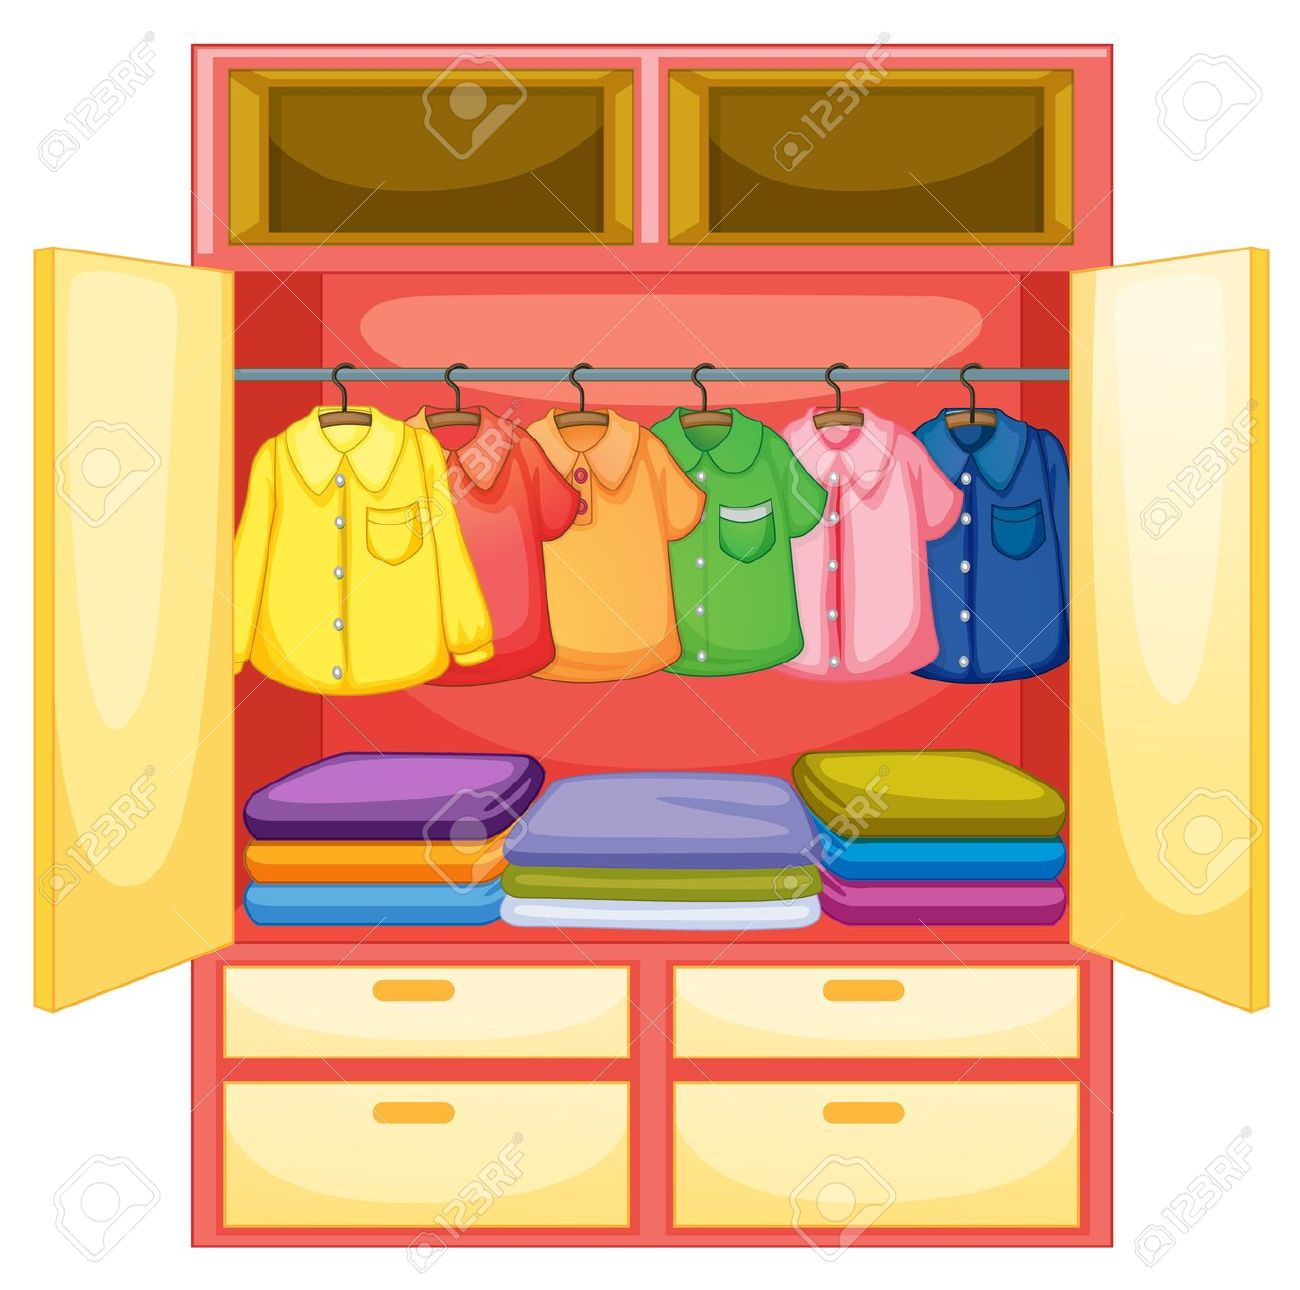 Wardrobe clipart  Wardrobe clipart - Clipground